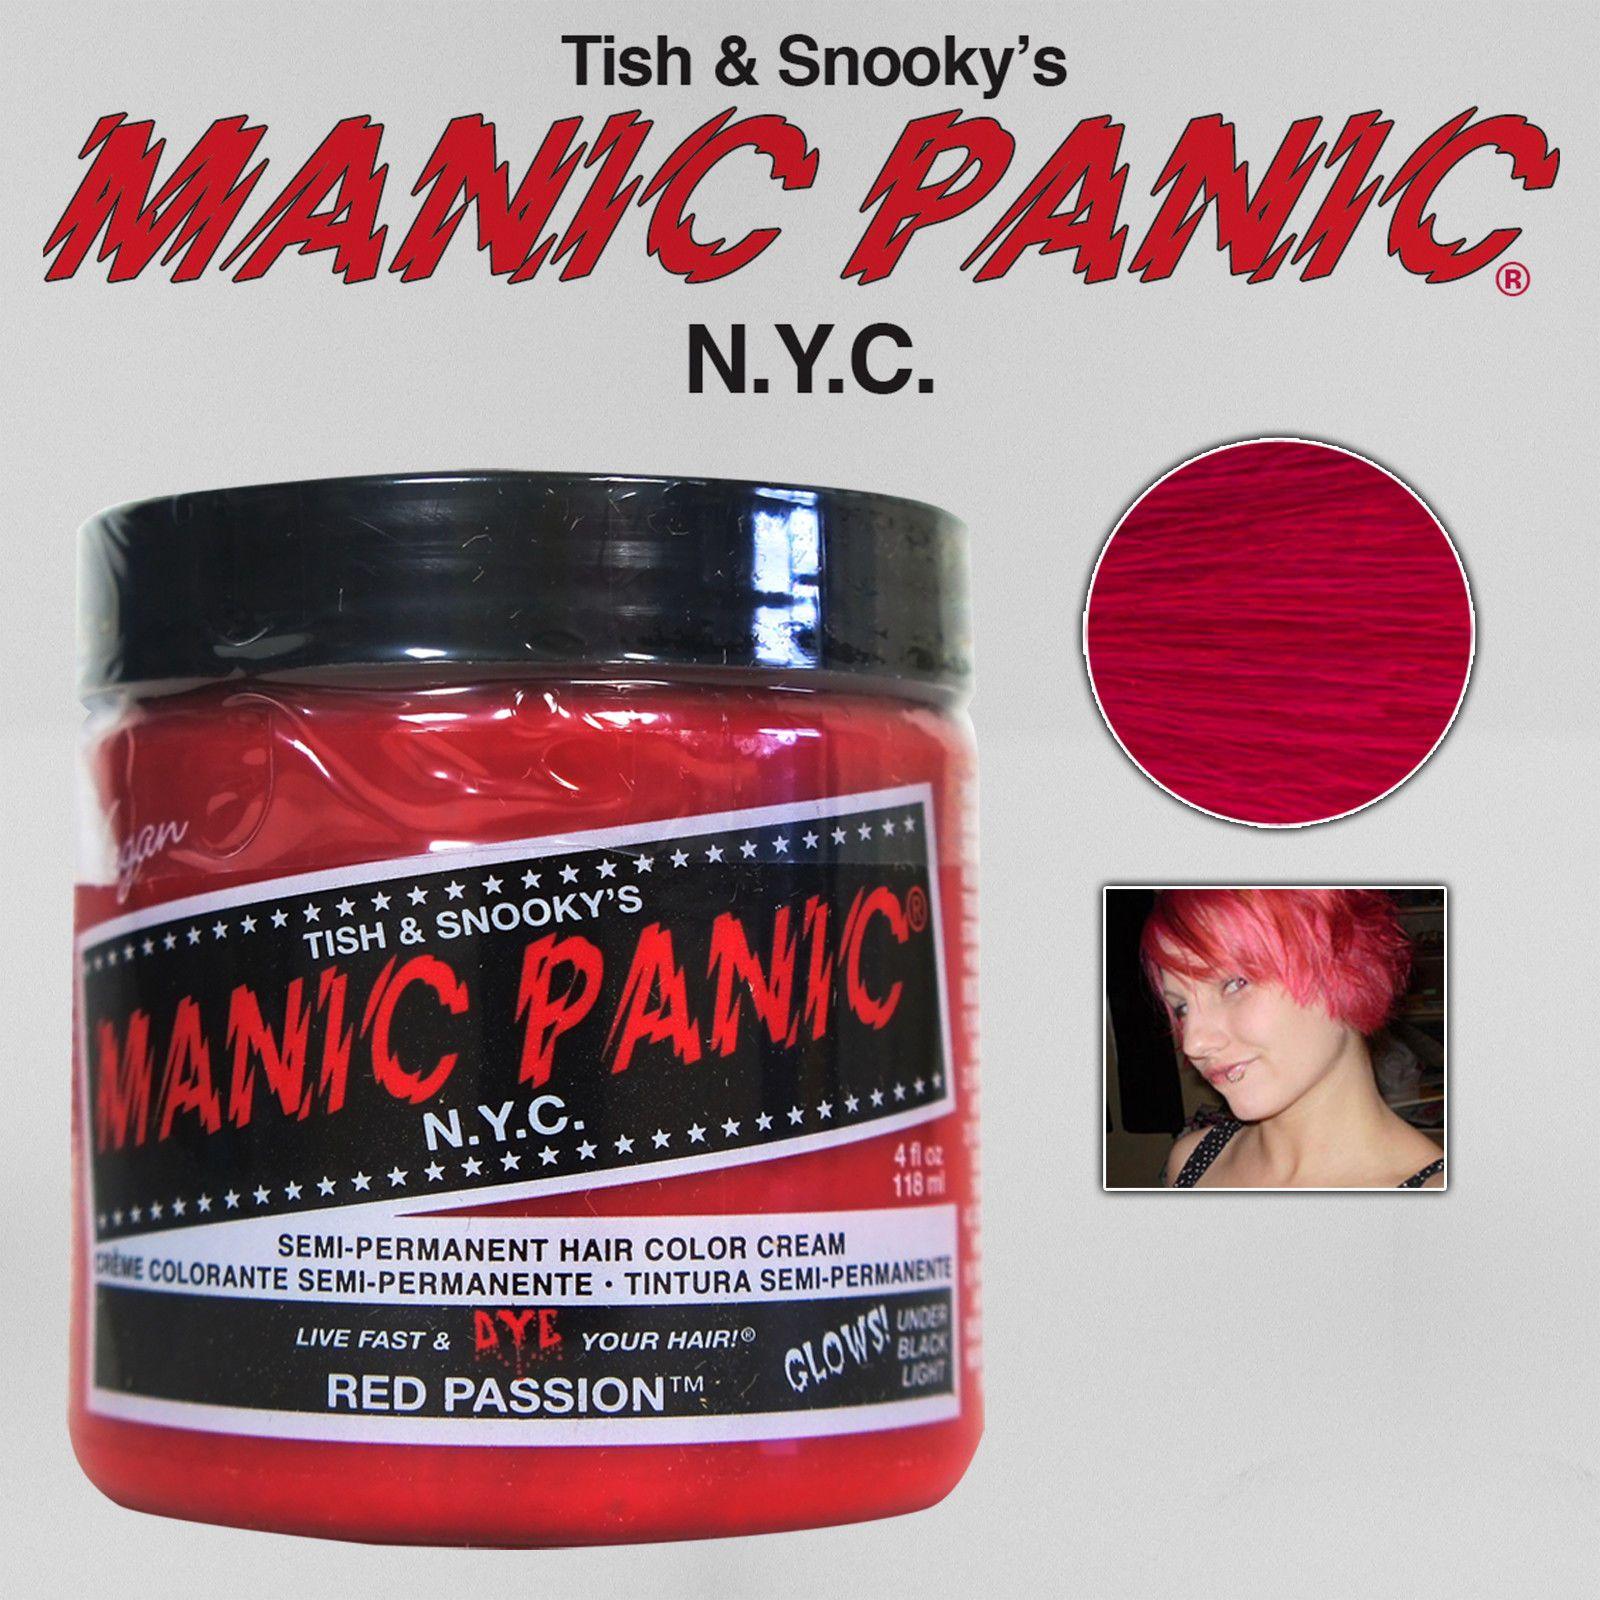 Details About Manic Panic Classic Semi Permanent Vegan Hair Dye Color All Colors 4 Oz New Vegan Hair Dye Hair Color Cream Dyed Hair